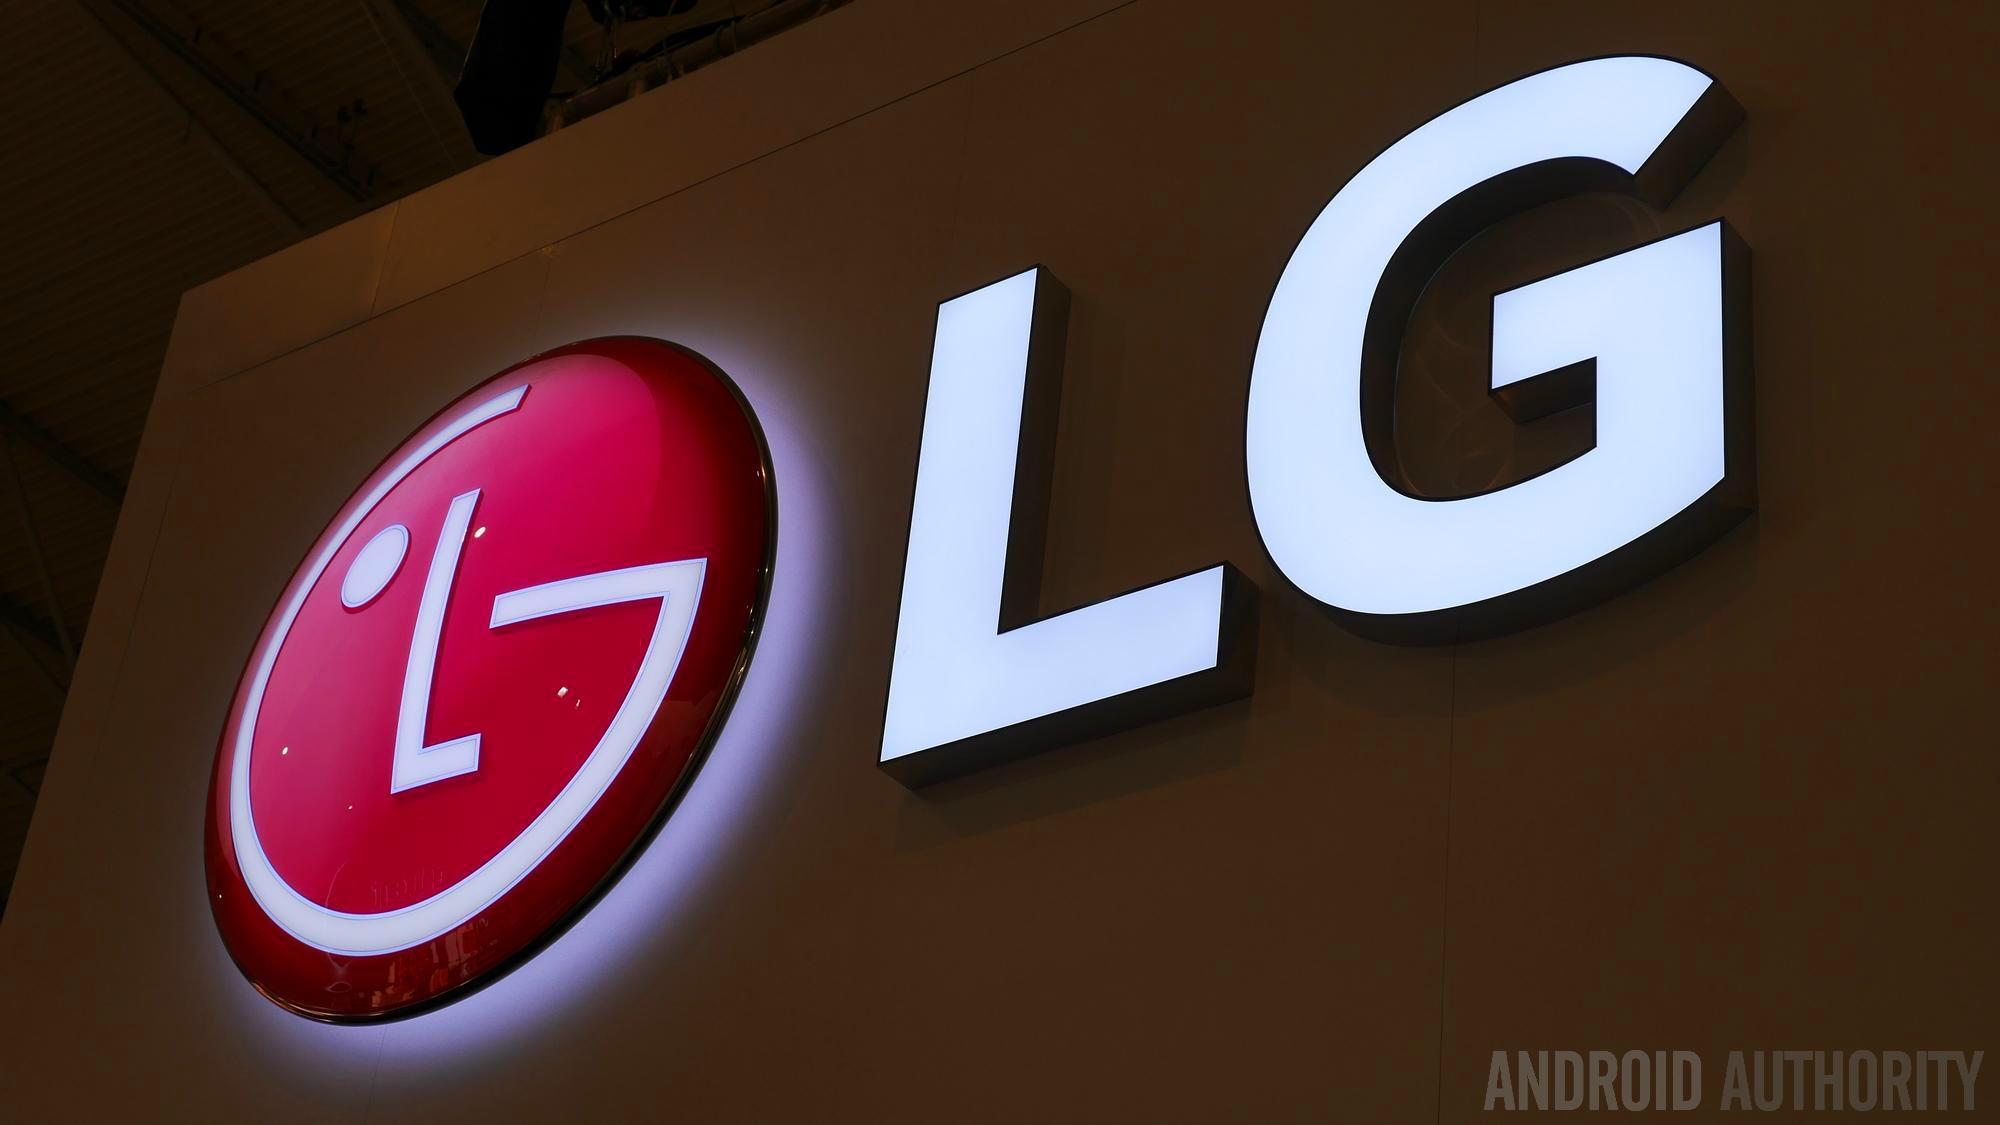 LG sees big profit in 2018, despite big mobile losses